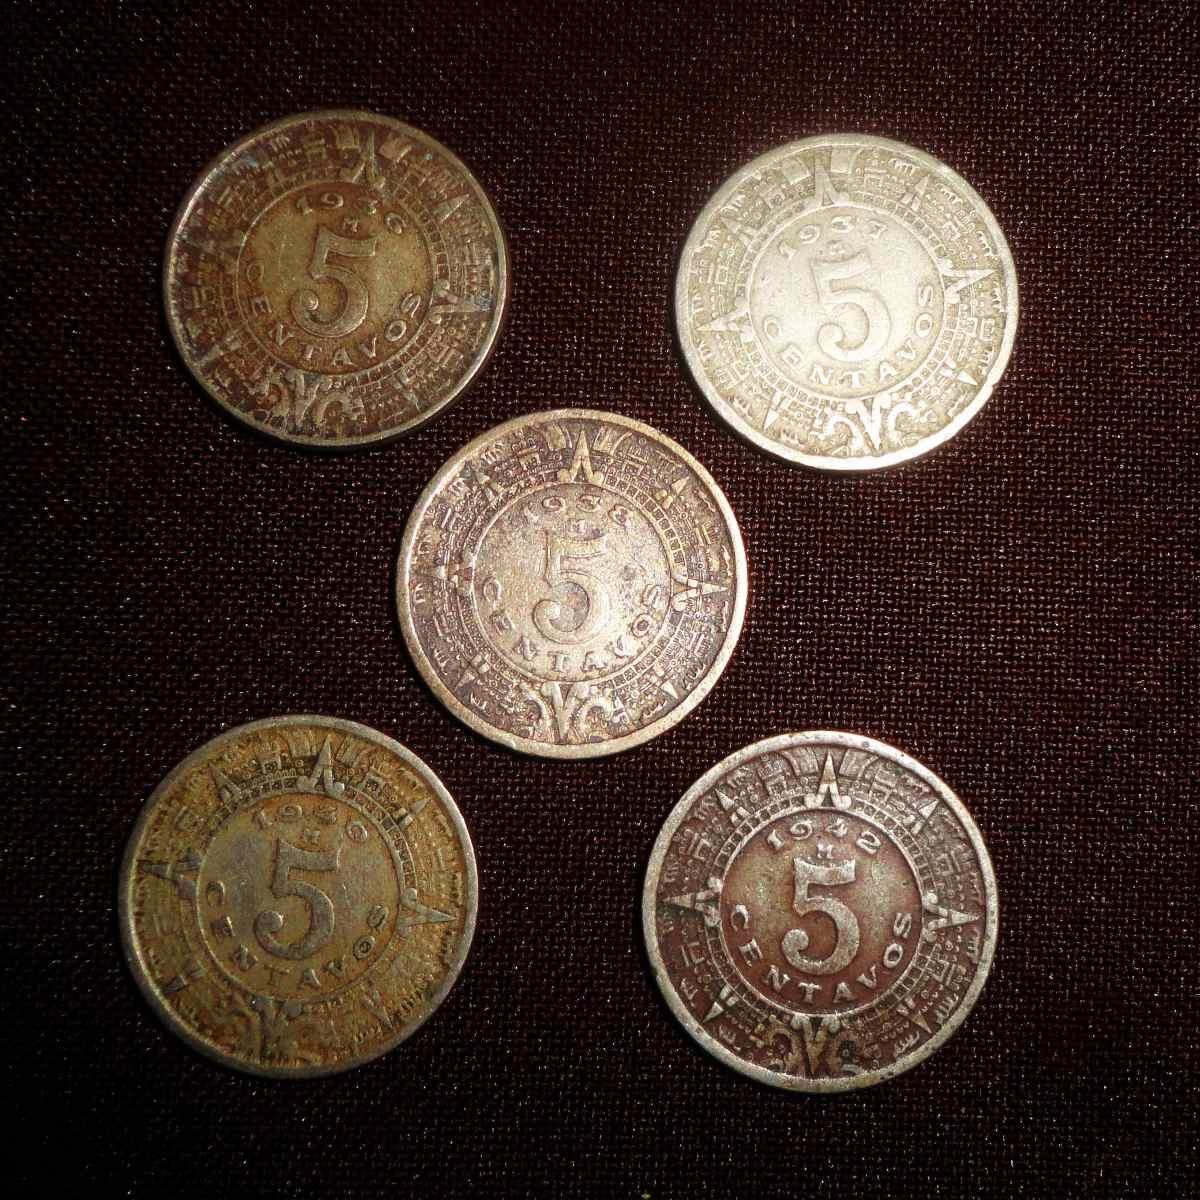 Calendario 1936.Lote 5 Centavos 1936 1942 Calendario Azteca Inlcuye 1938 300 00